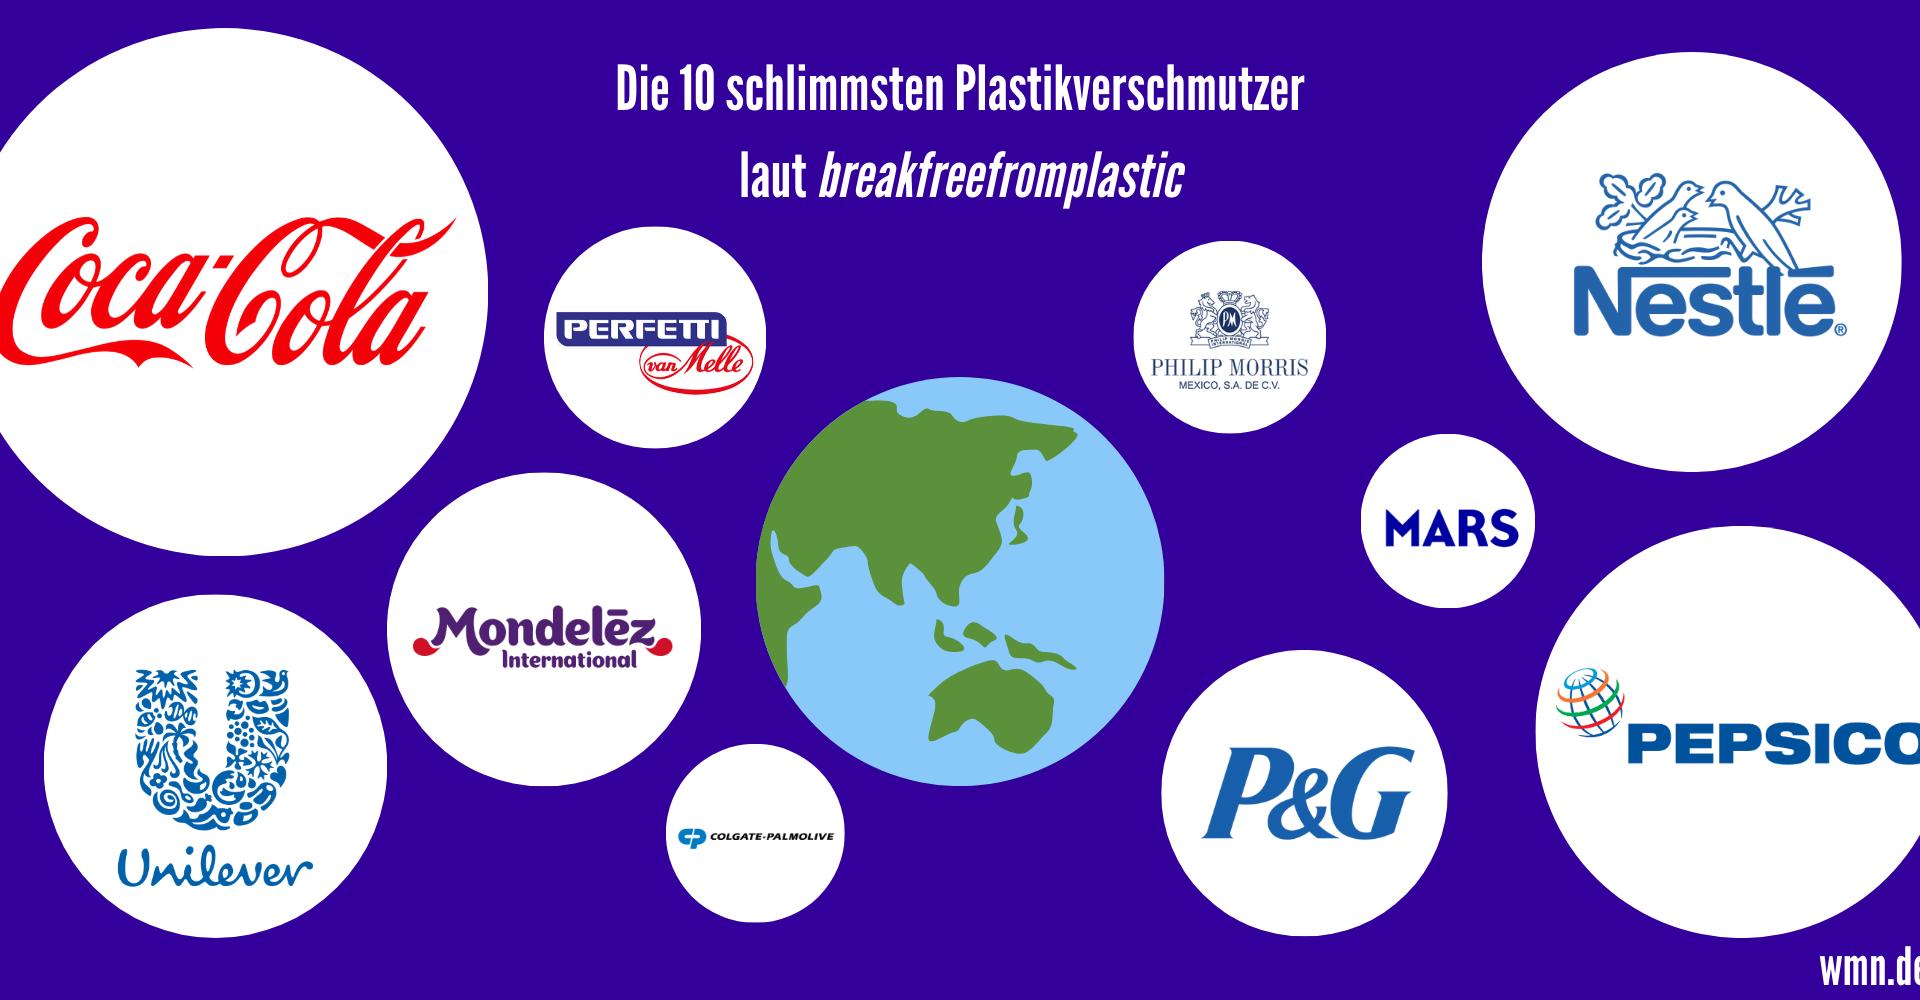 Größte Plastikverschmutzer